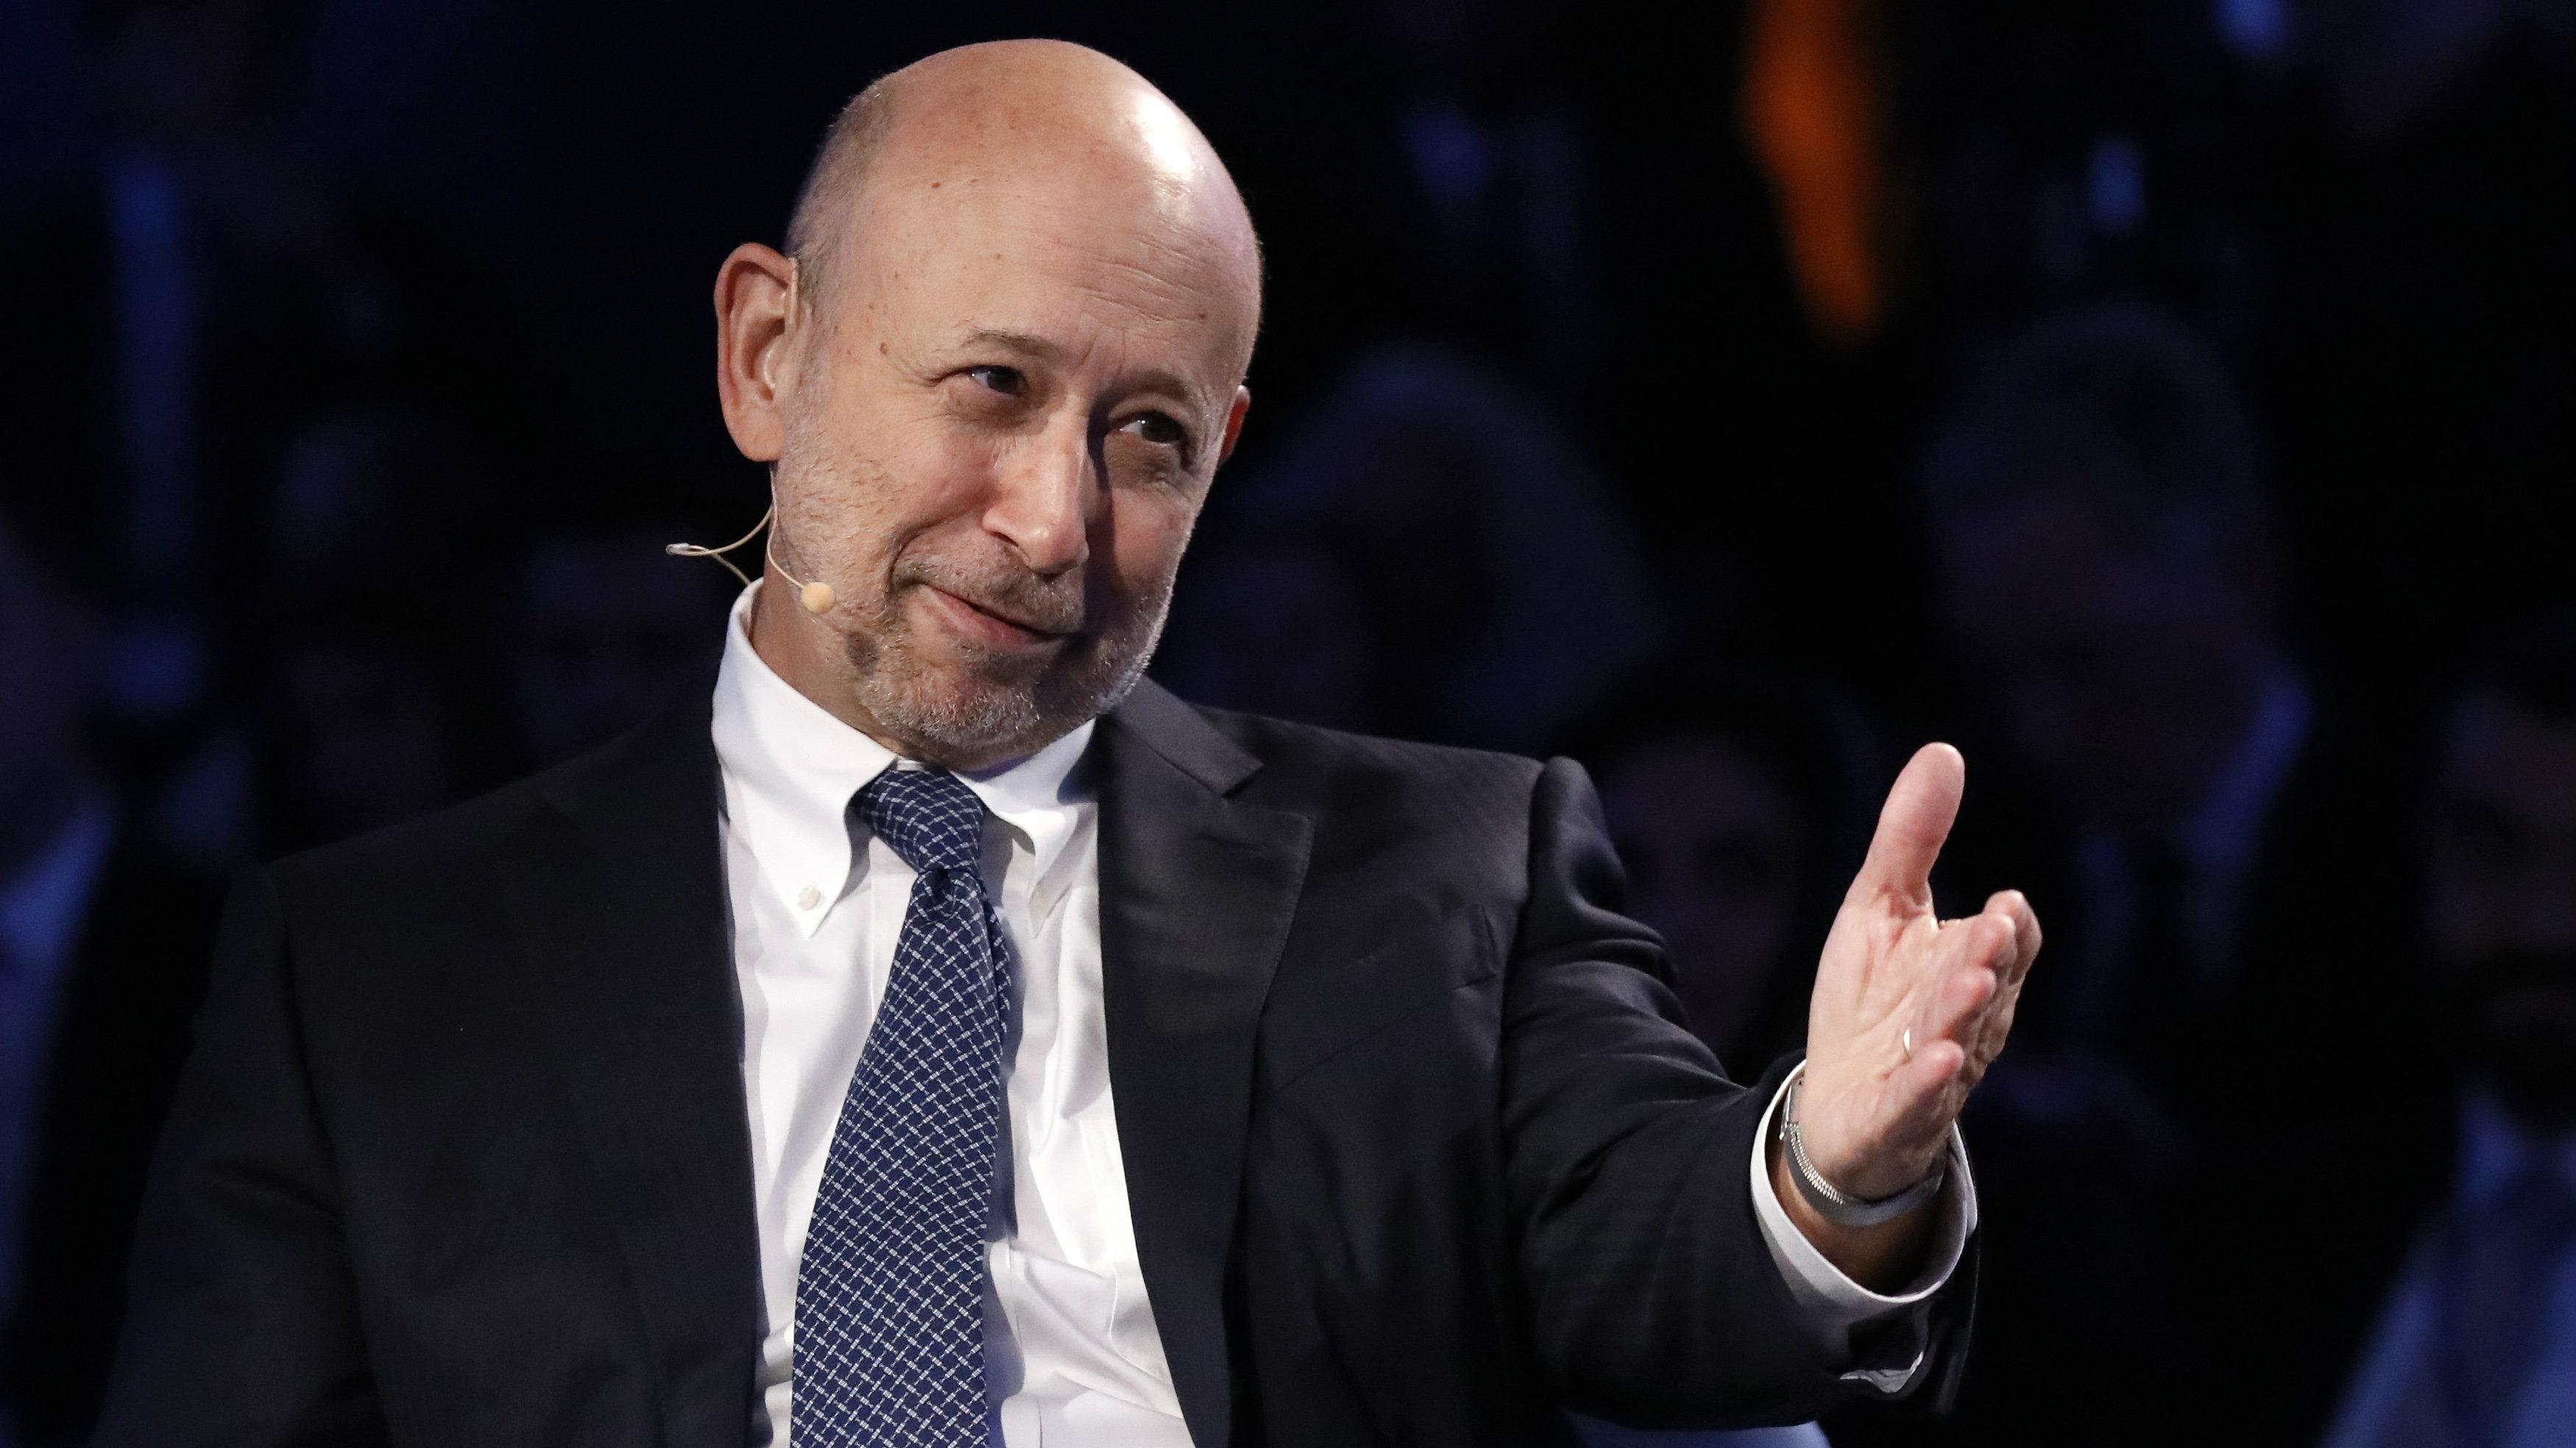 Goldman Sachs officially announced David Solomon as Lloyd